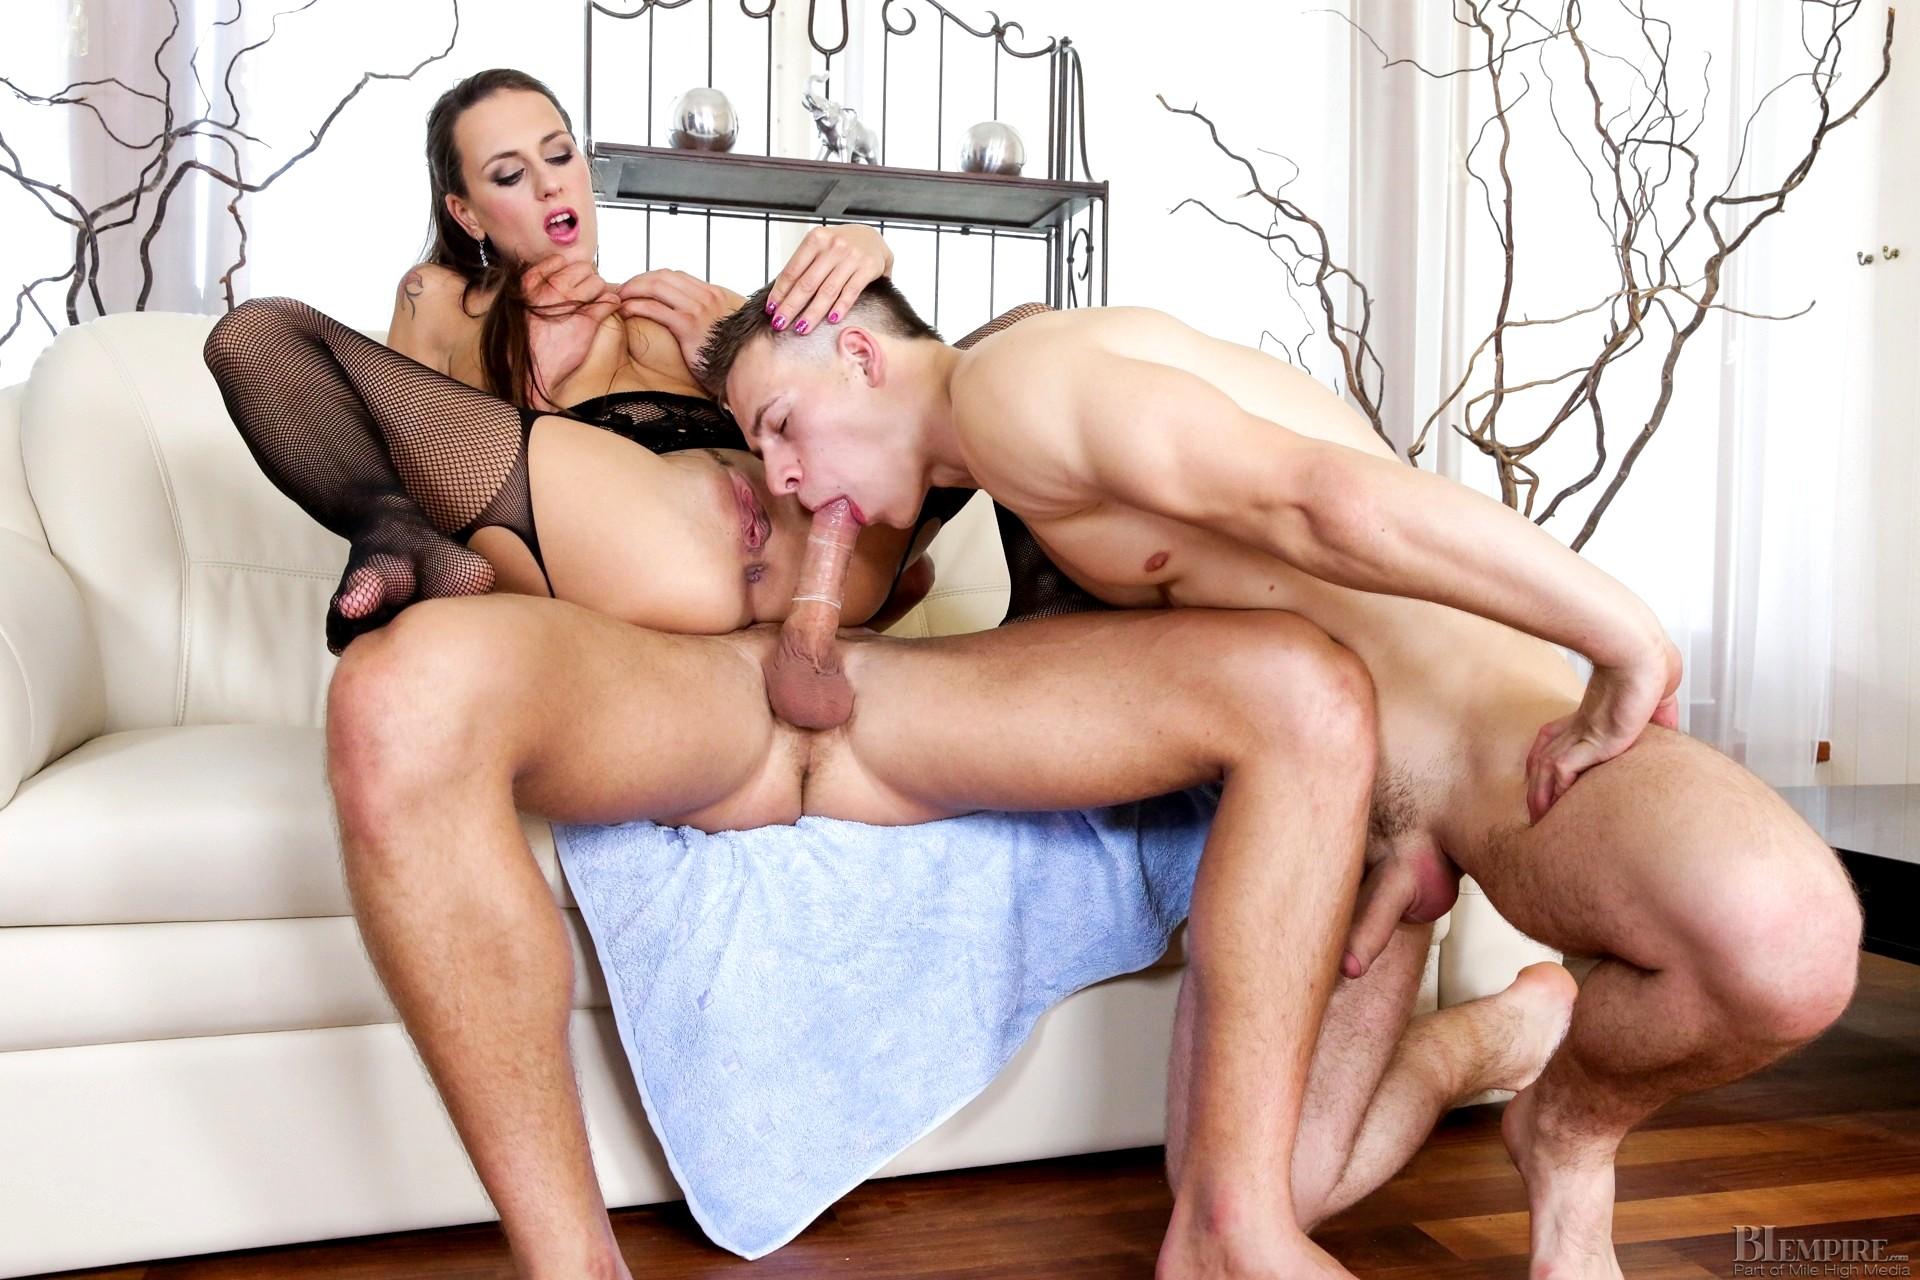 Bi sex porn pictures nude flash mos